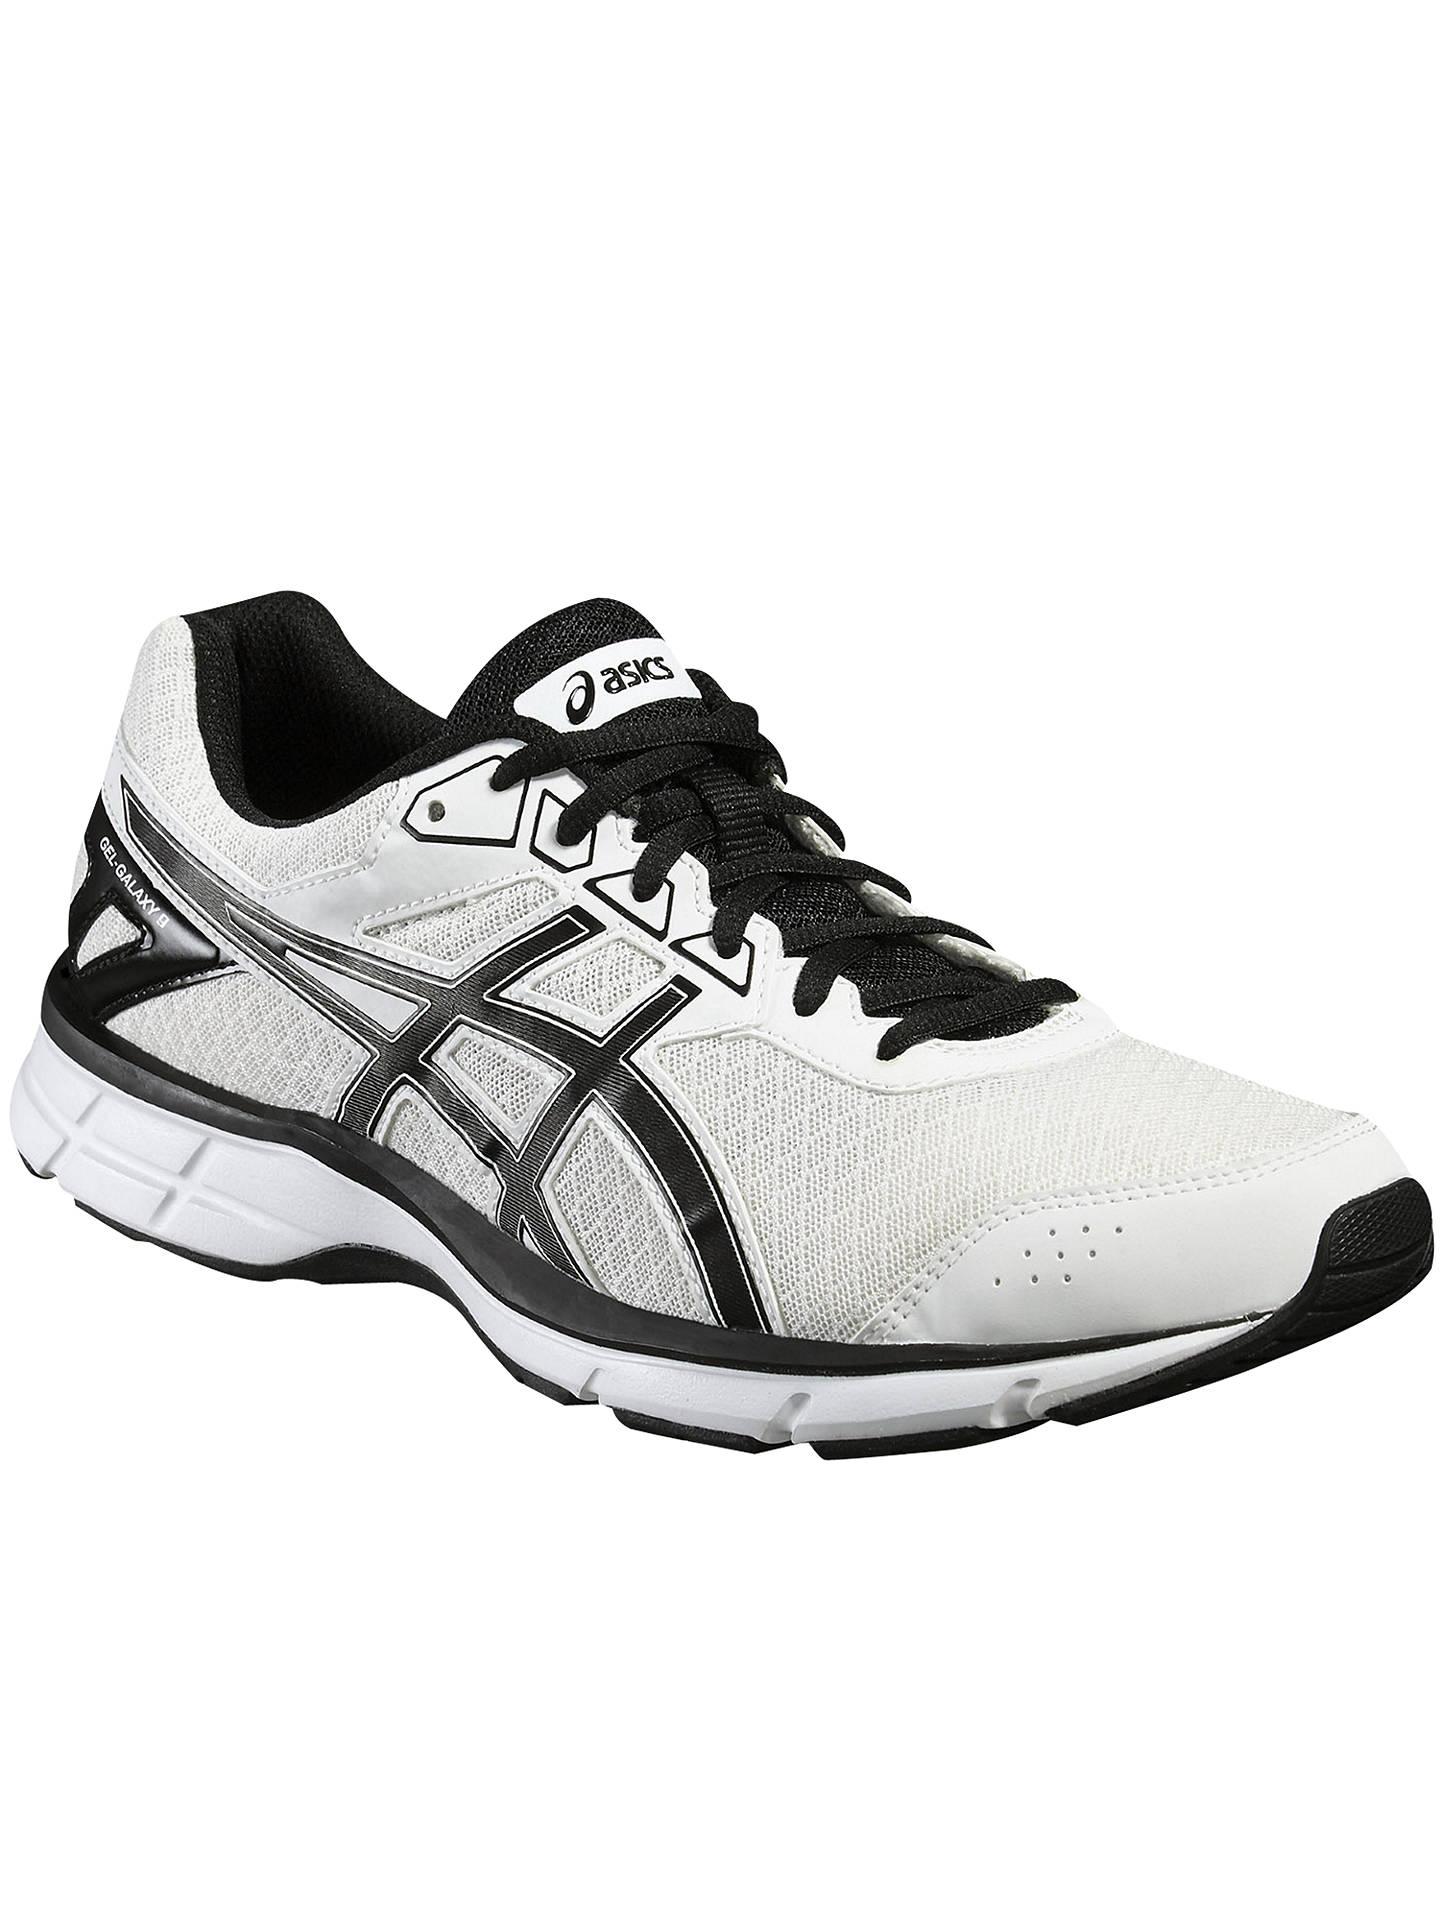 Asics GEL Galaxy 9 Men's Running scarpa